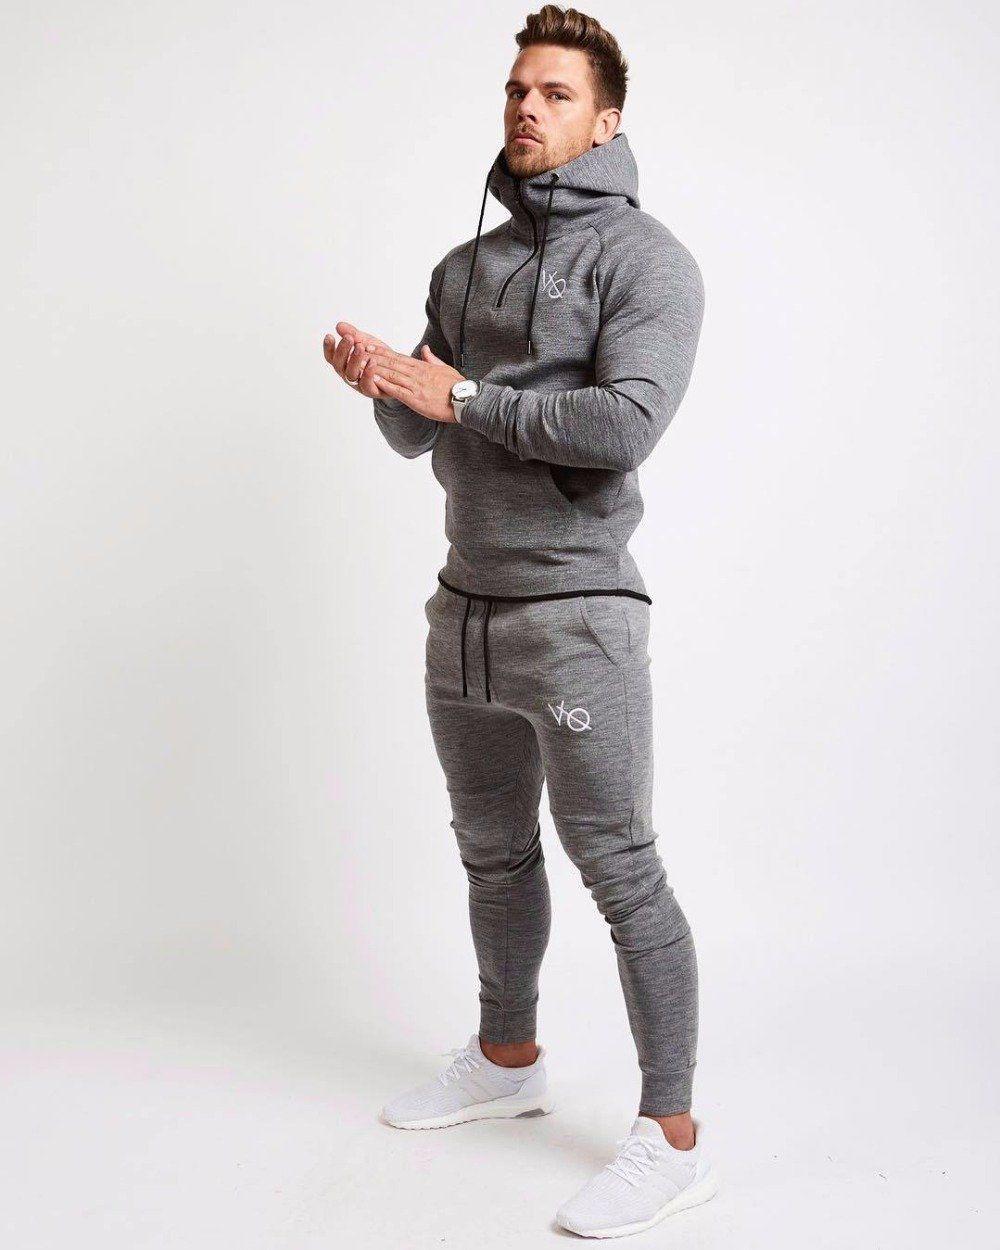 40f81514509d Set Men s Fashion Sportswear Tracksuits Sets Men s Bodybuilding  hoodie –  myshoponline.com